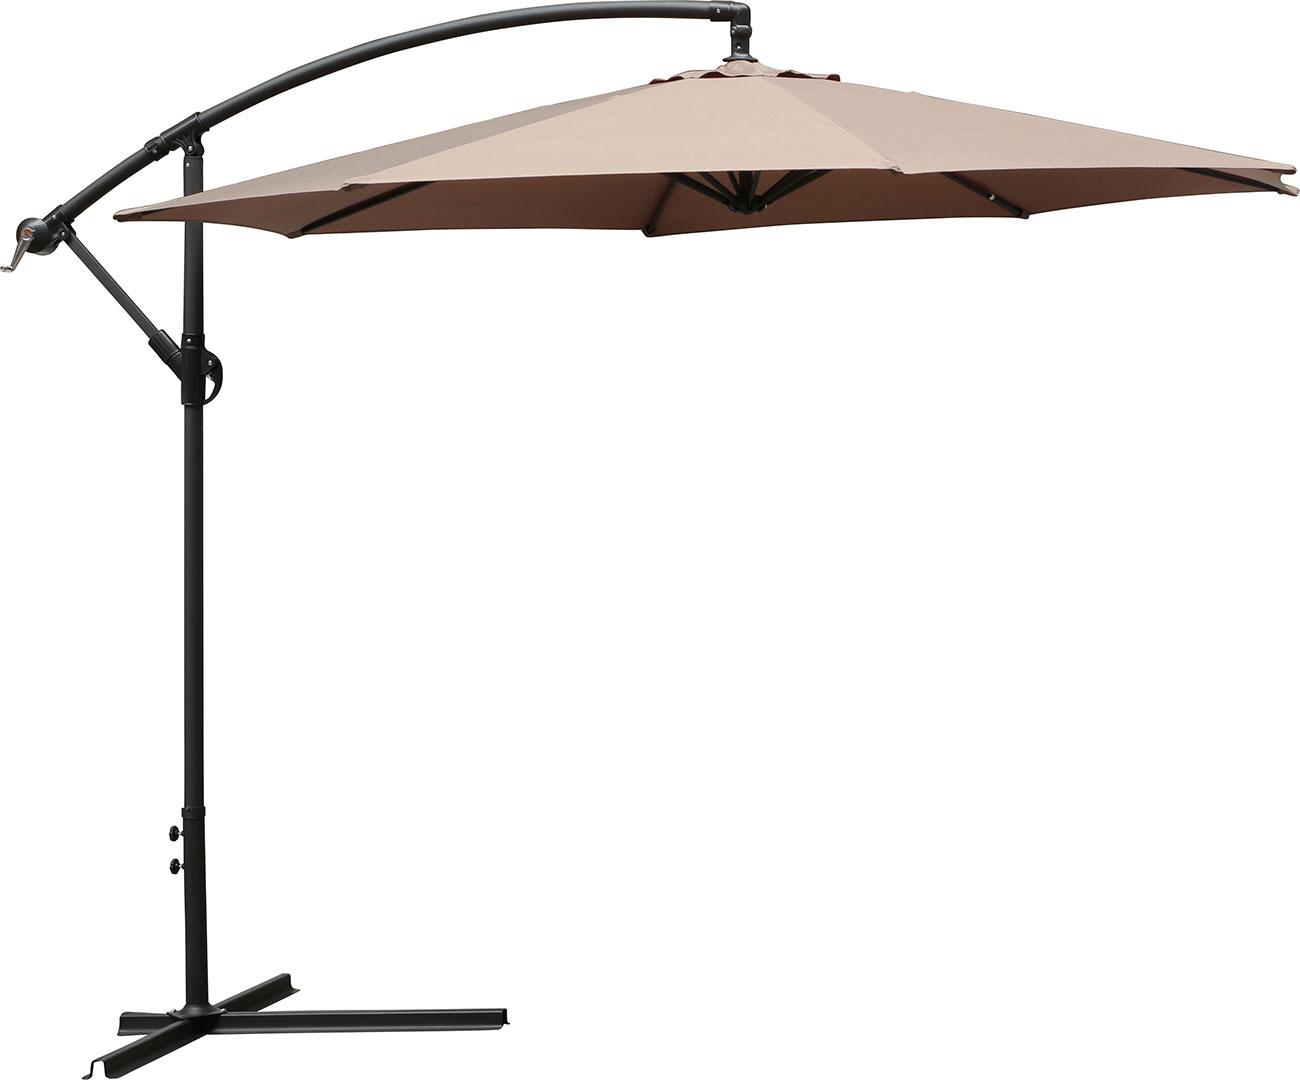 ampelschirm siena sonnenschirm 300 cm farbe taupe. Black Bedroom Furniture Sets. Home Design Ideas